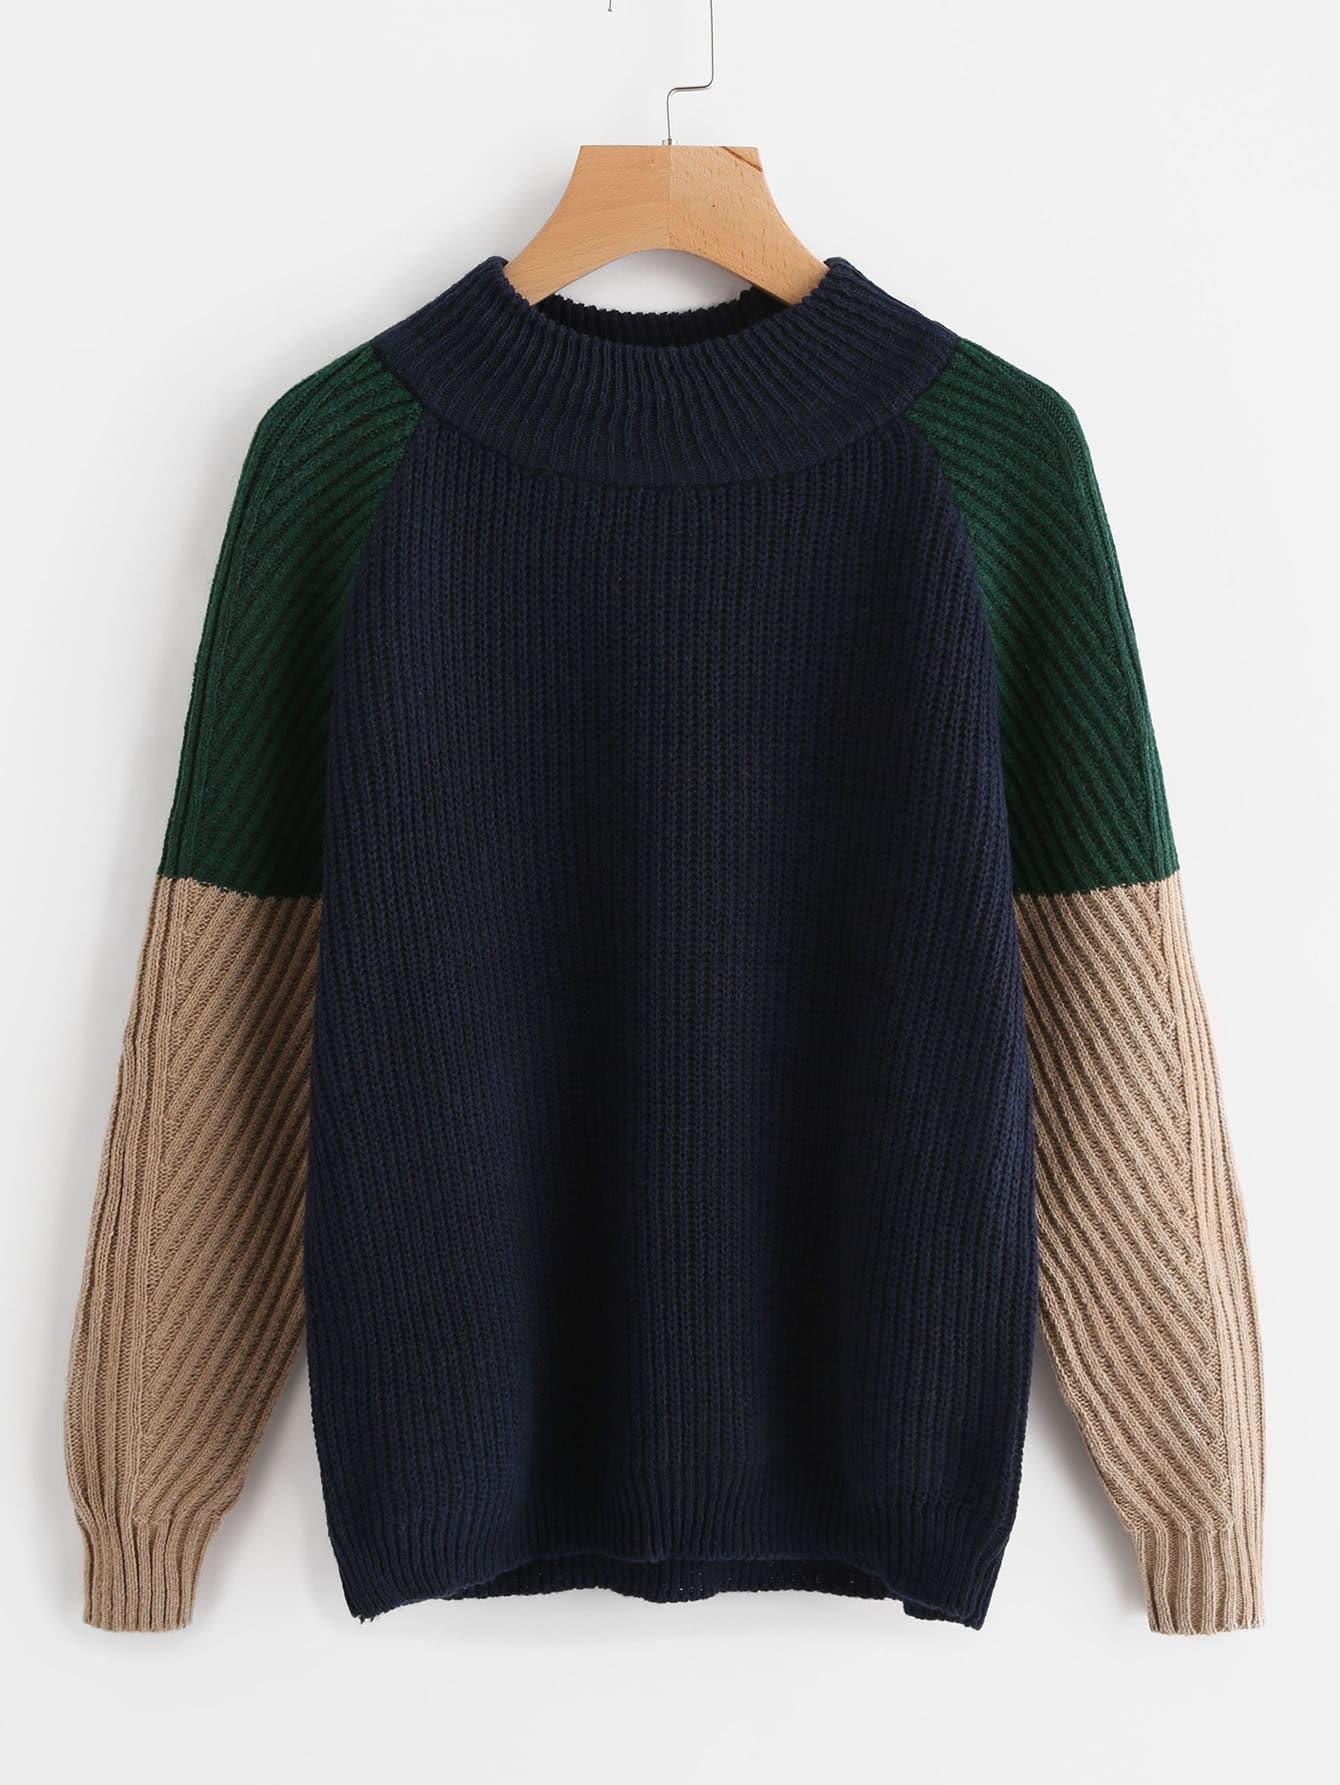 Contrast Raglan Sleeve Sweater sweater170906110